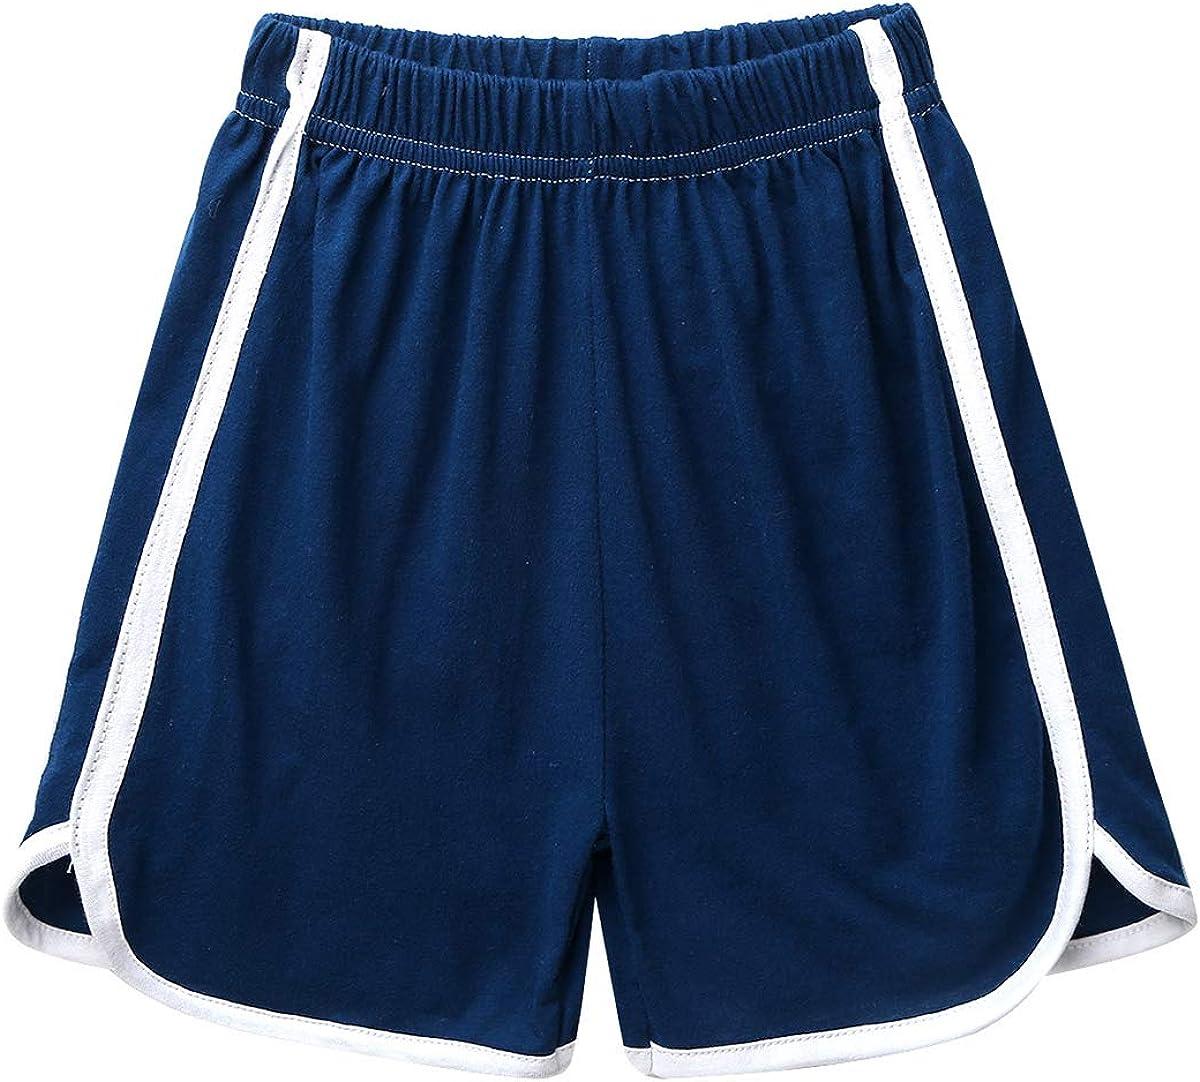 YiZYiF Kids Little Boys Girls Cotton Elastic Casual Running Workout Yoga Shorts Sports Exercise Fitness Short Pants